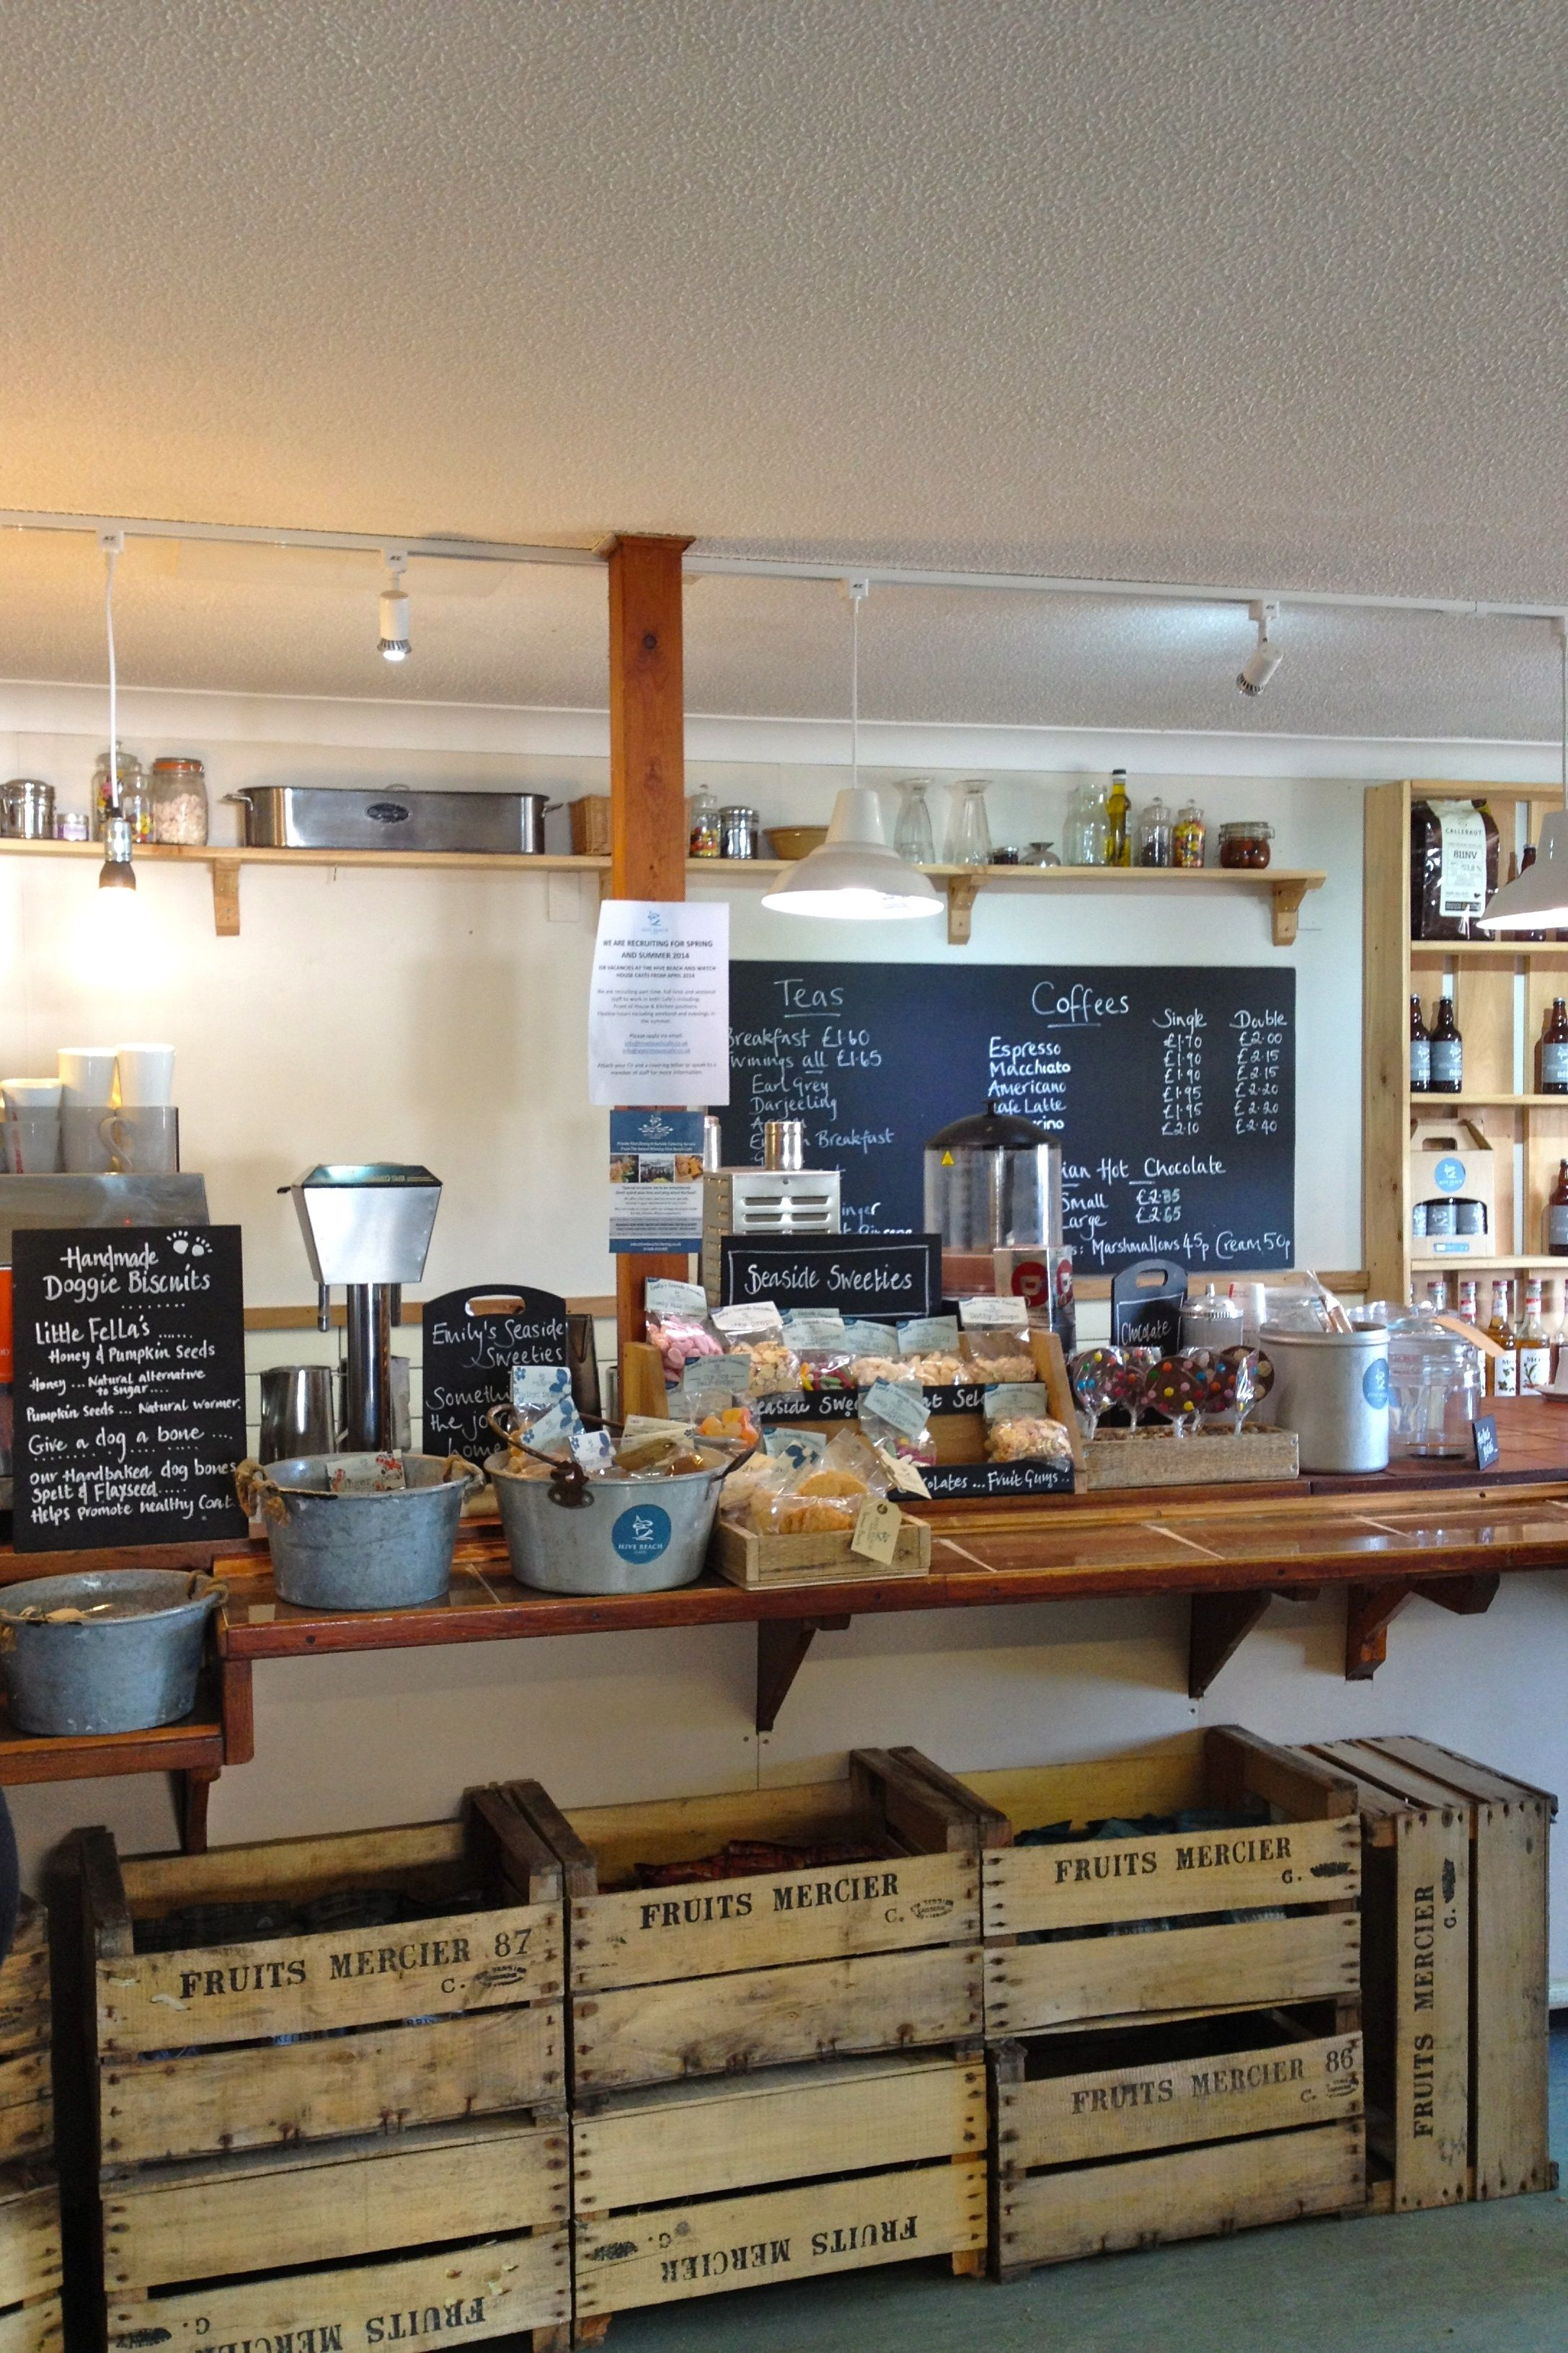 Cafe Interior Cafe Interior Coffee Room Rustic Cafe